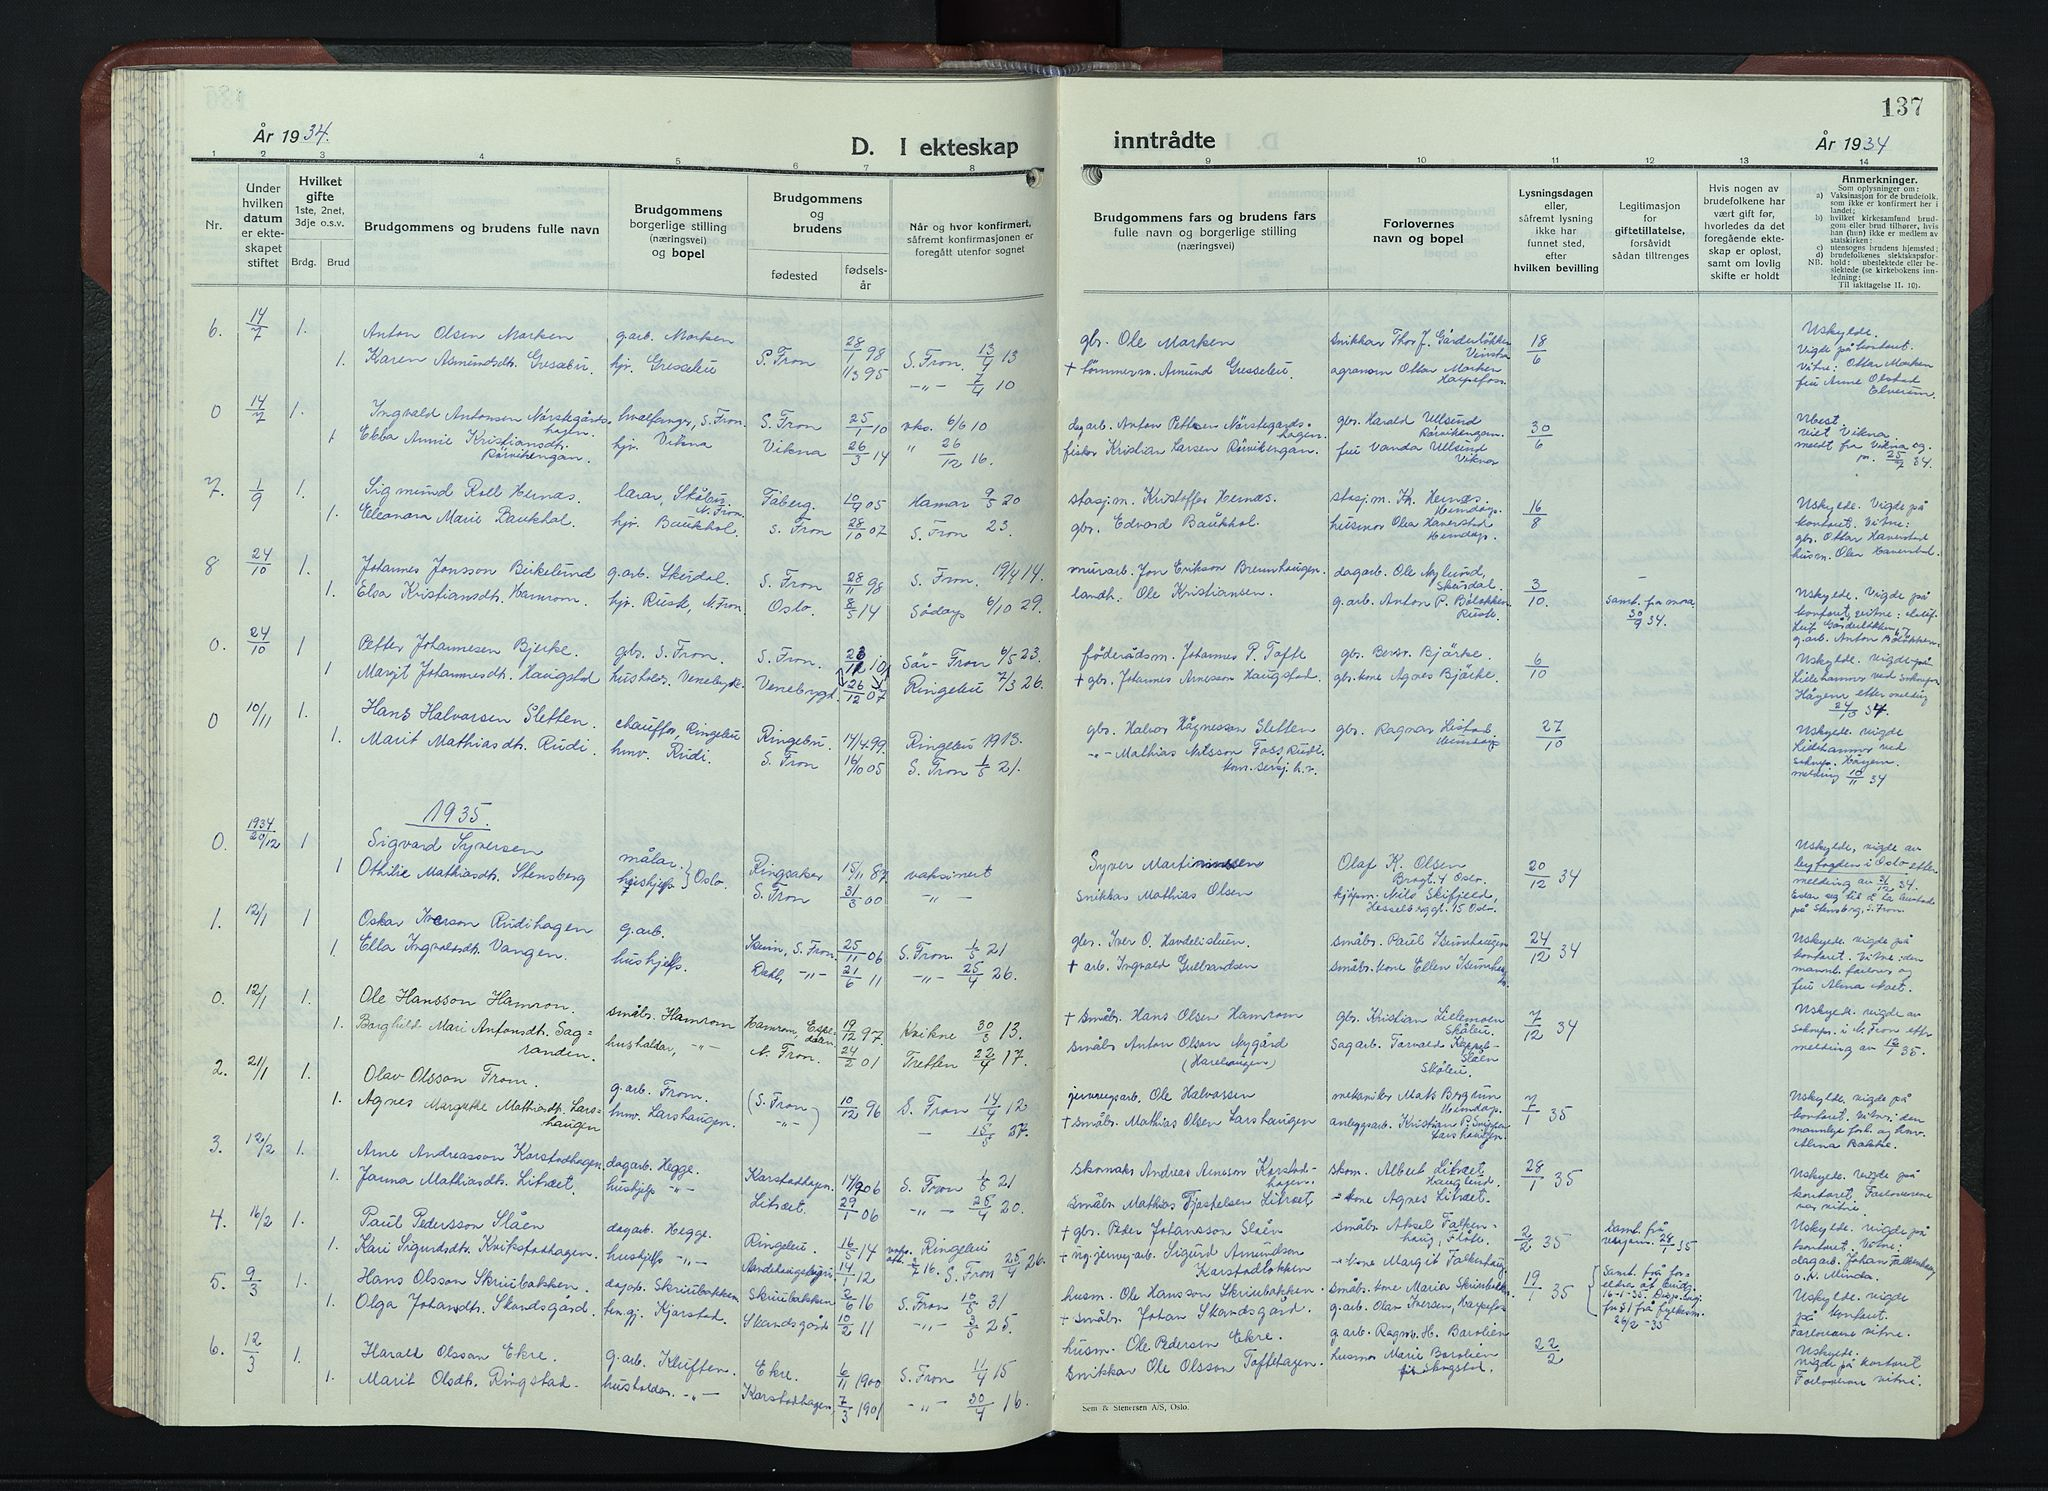 SAH, Sør-Fron prestekontor, H/Ha/Hab/L0006: Klokkerbok nr. 6, 1933-1948, s. 137